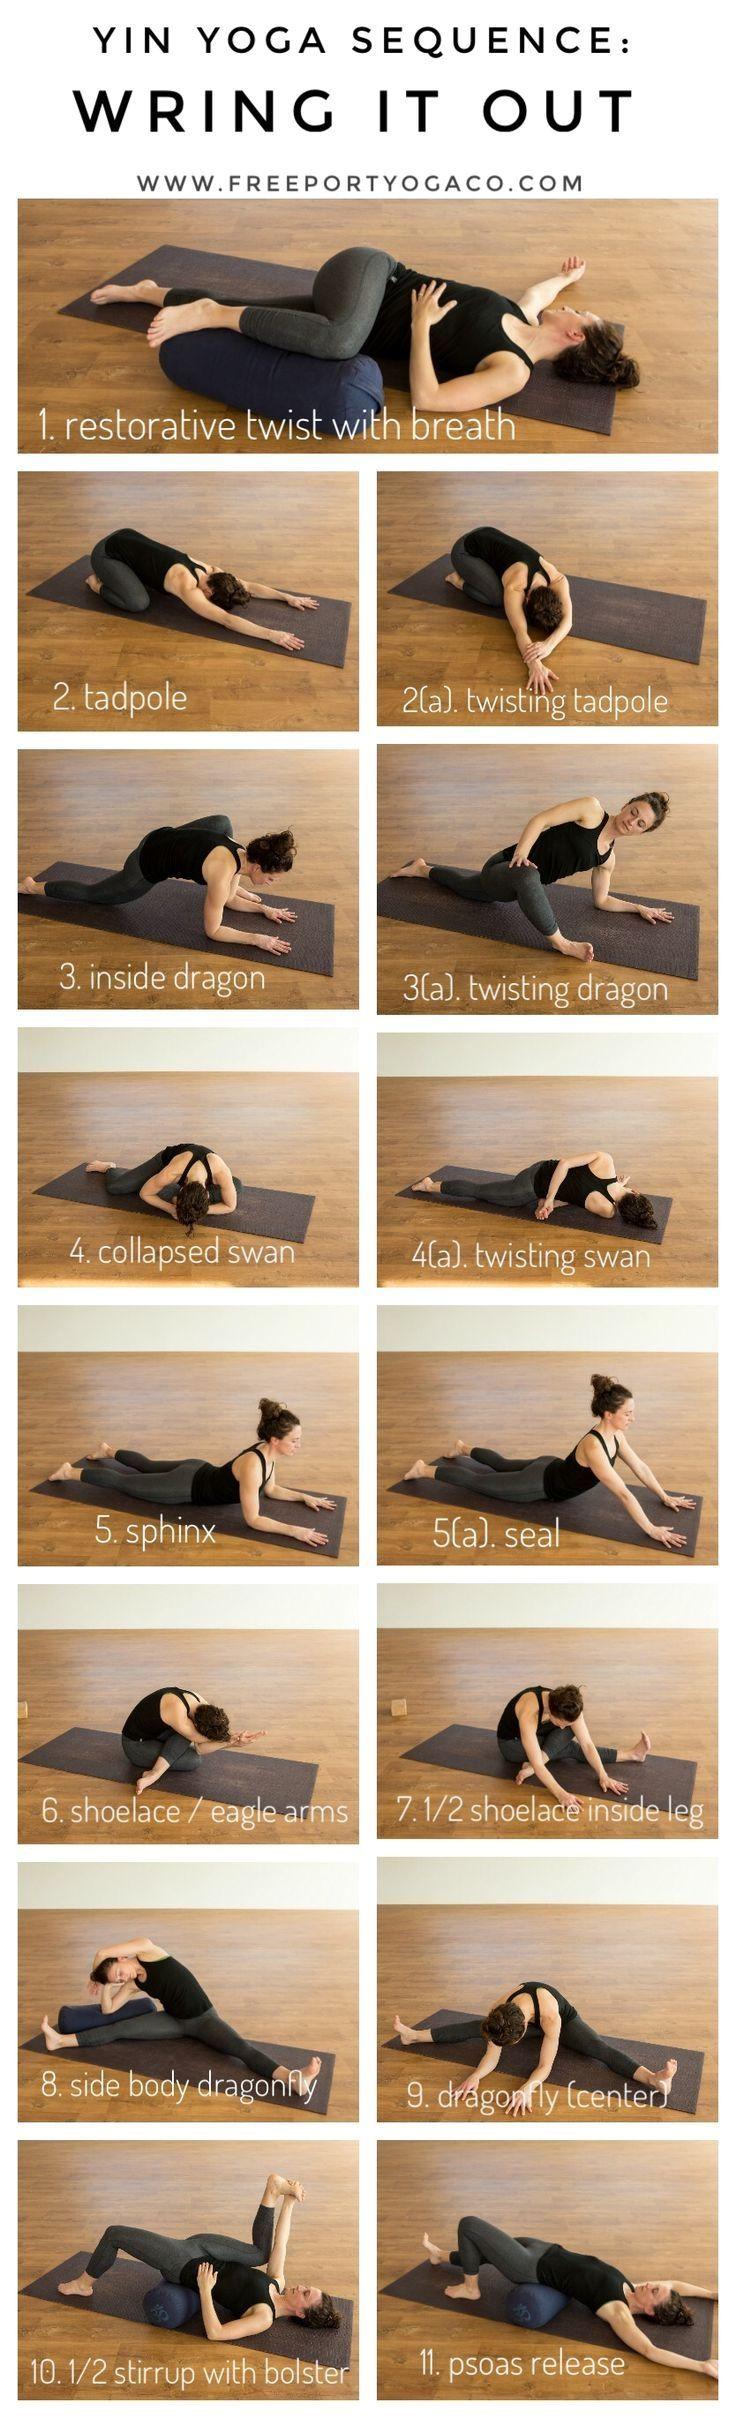 Poses De Yoga - #30min #abworkout #crossfit #exercise #exercises #fitness #fitnesscomida #Fitnessmot...